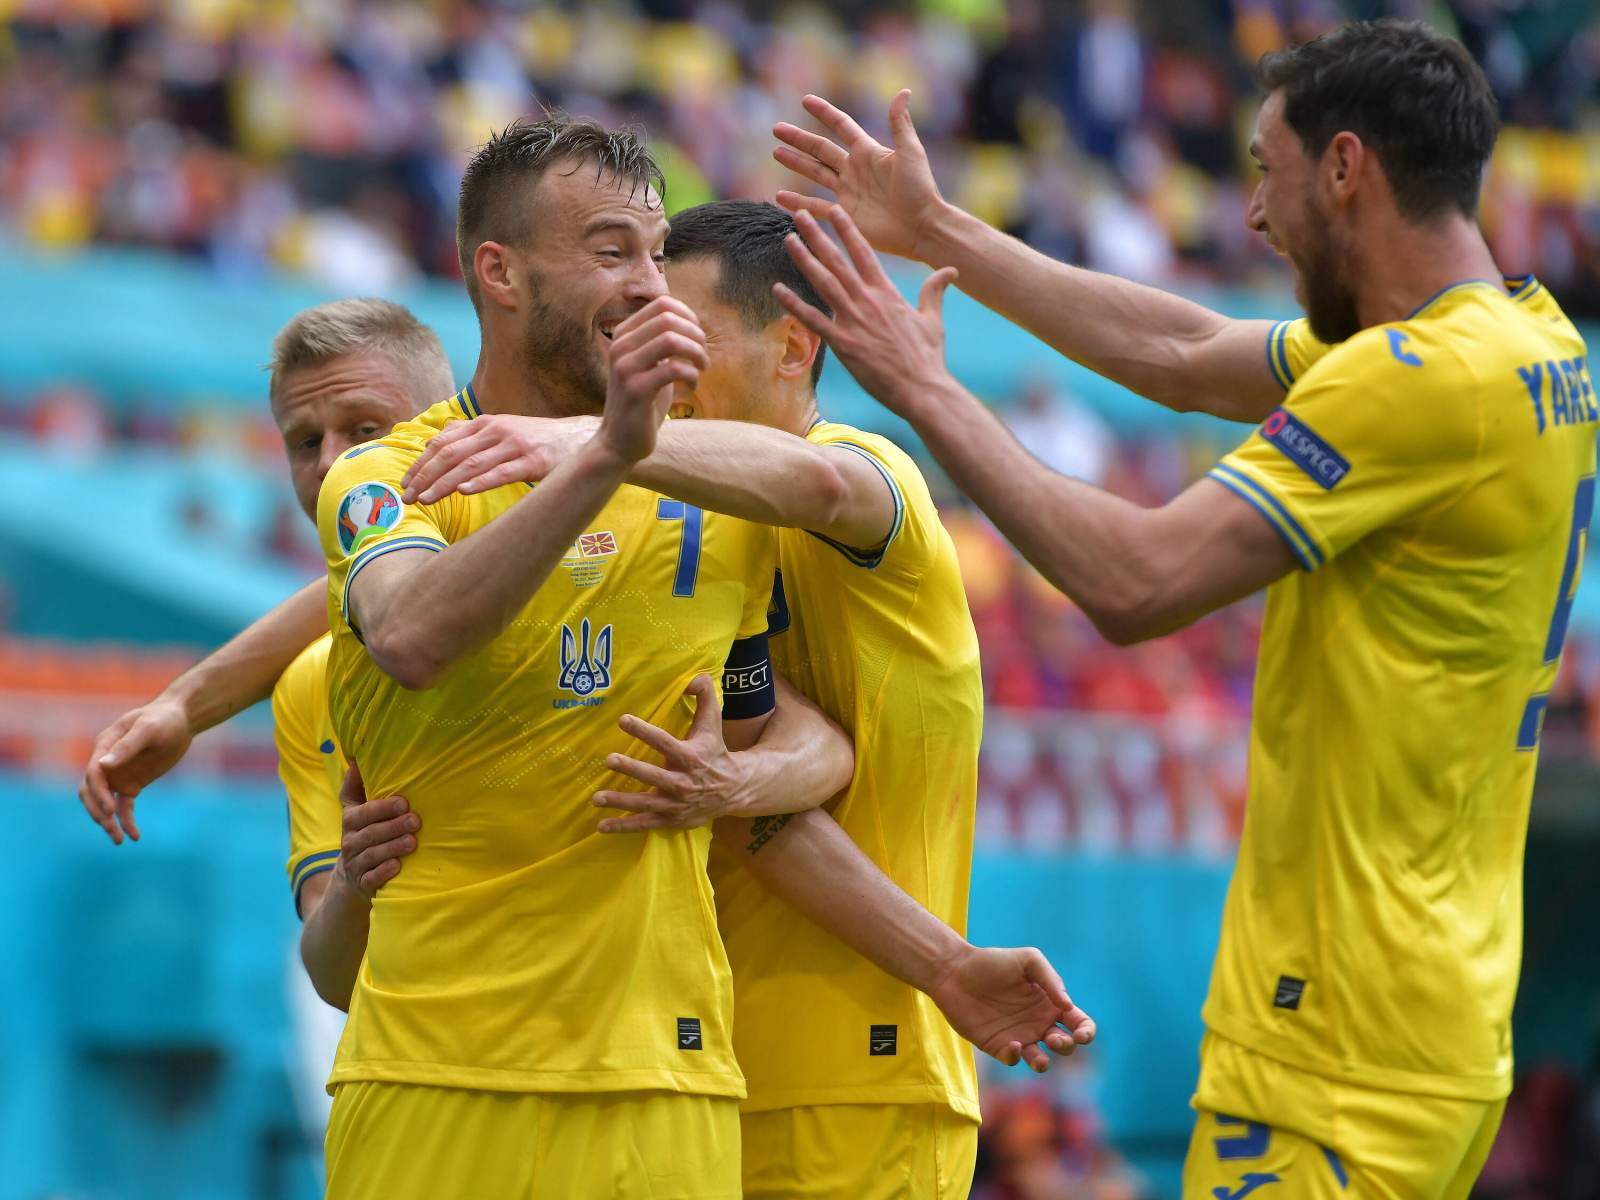 Чехия - Украина - 1:1 (закончен)